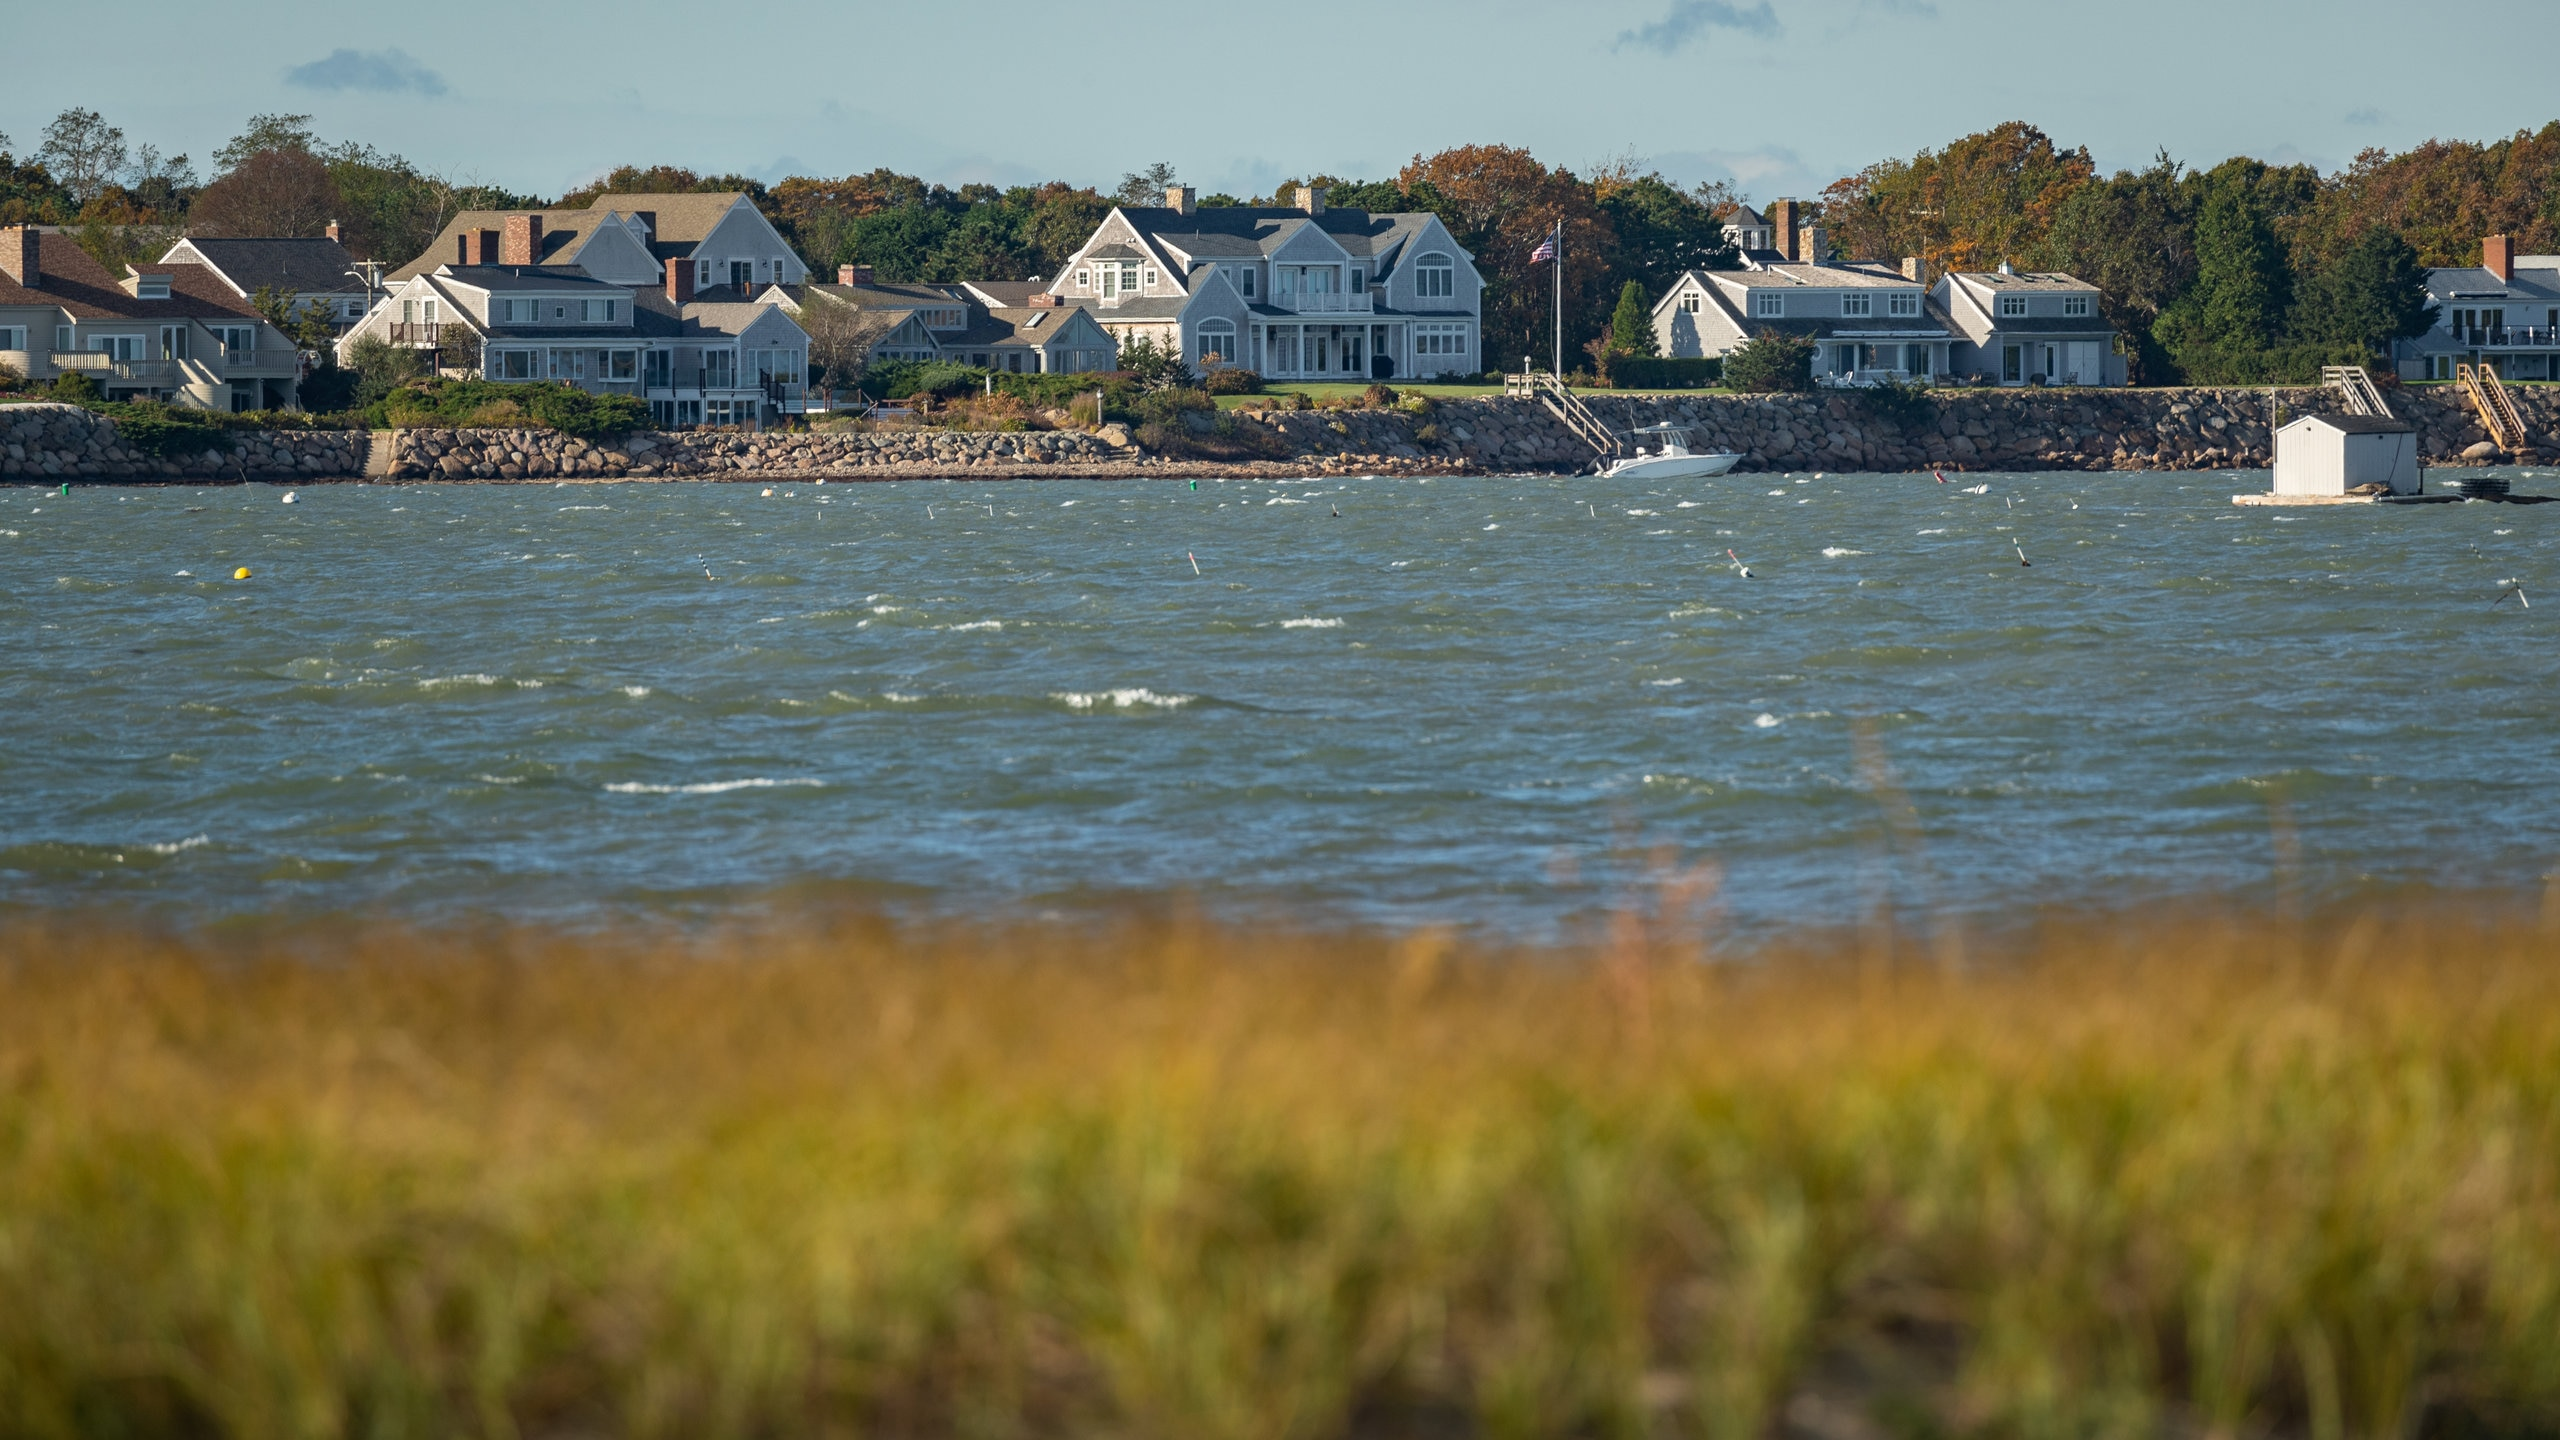 North Falmouth, Massachusetts, United States of America